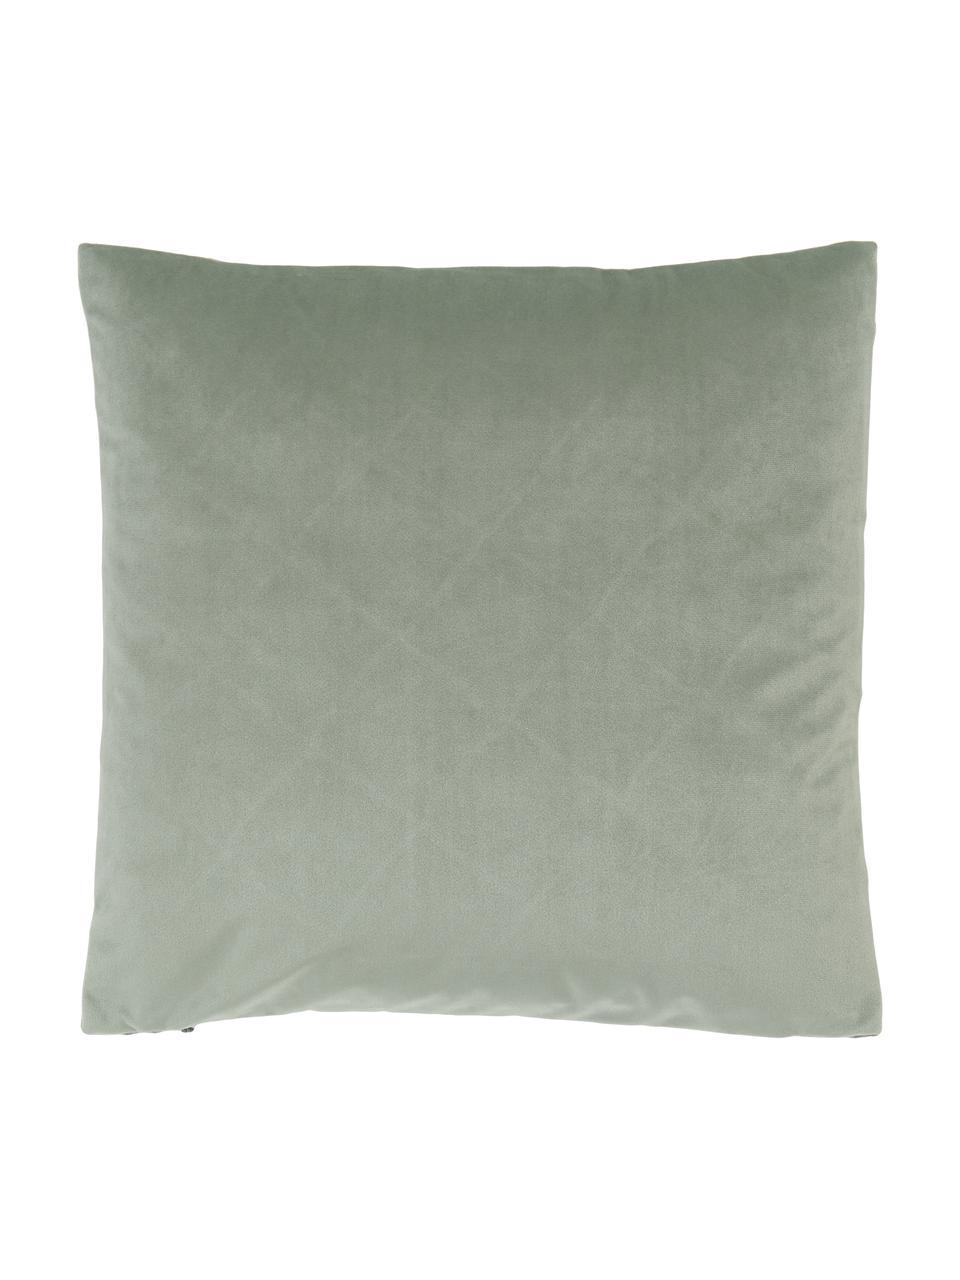 Federa arredo in velluto verde salvia con motivo rombi Luka, Velluto (100% poliestere), Verde, Larg. 40 x Lung. 40 cm